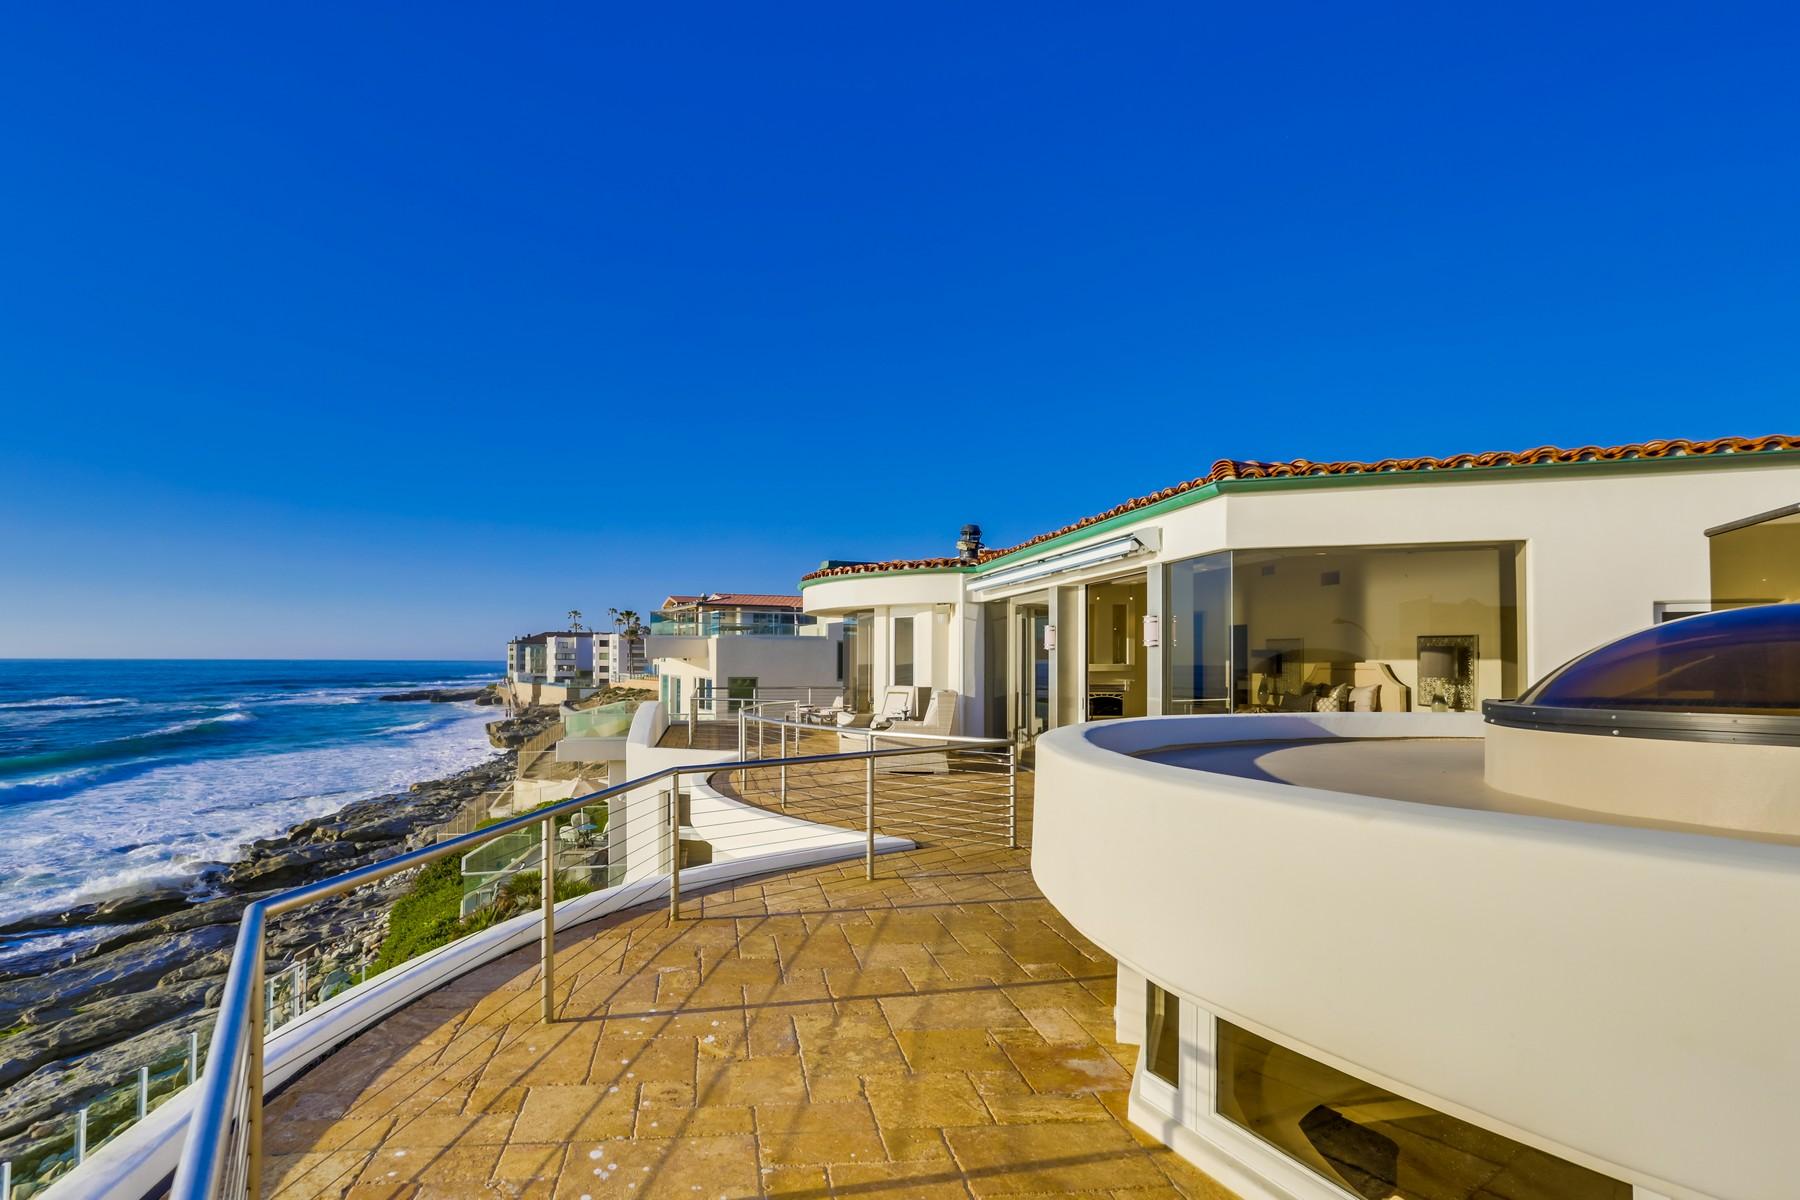 Additional photo for property listing at 7400 Vista Del Mar  La Jolla, California 92037 Estados Unidos